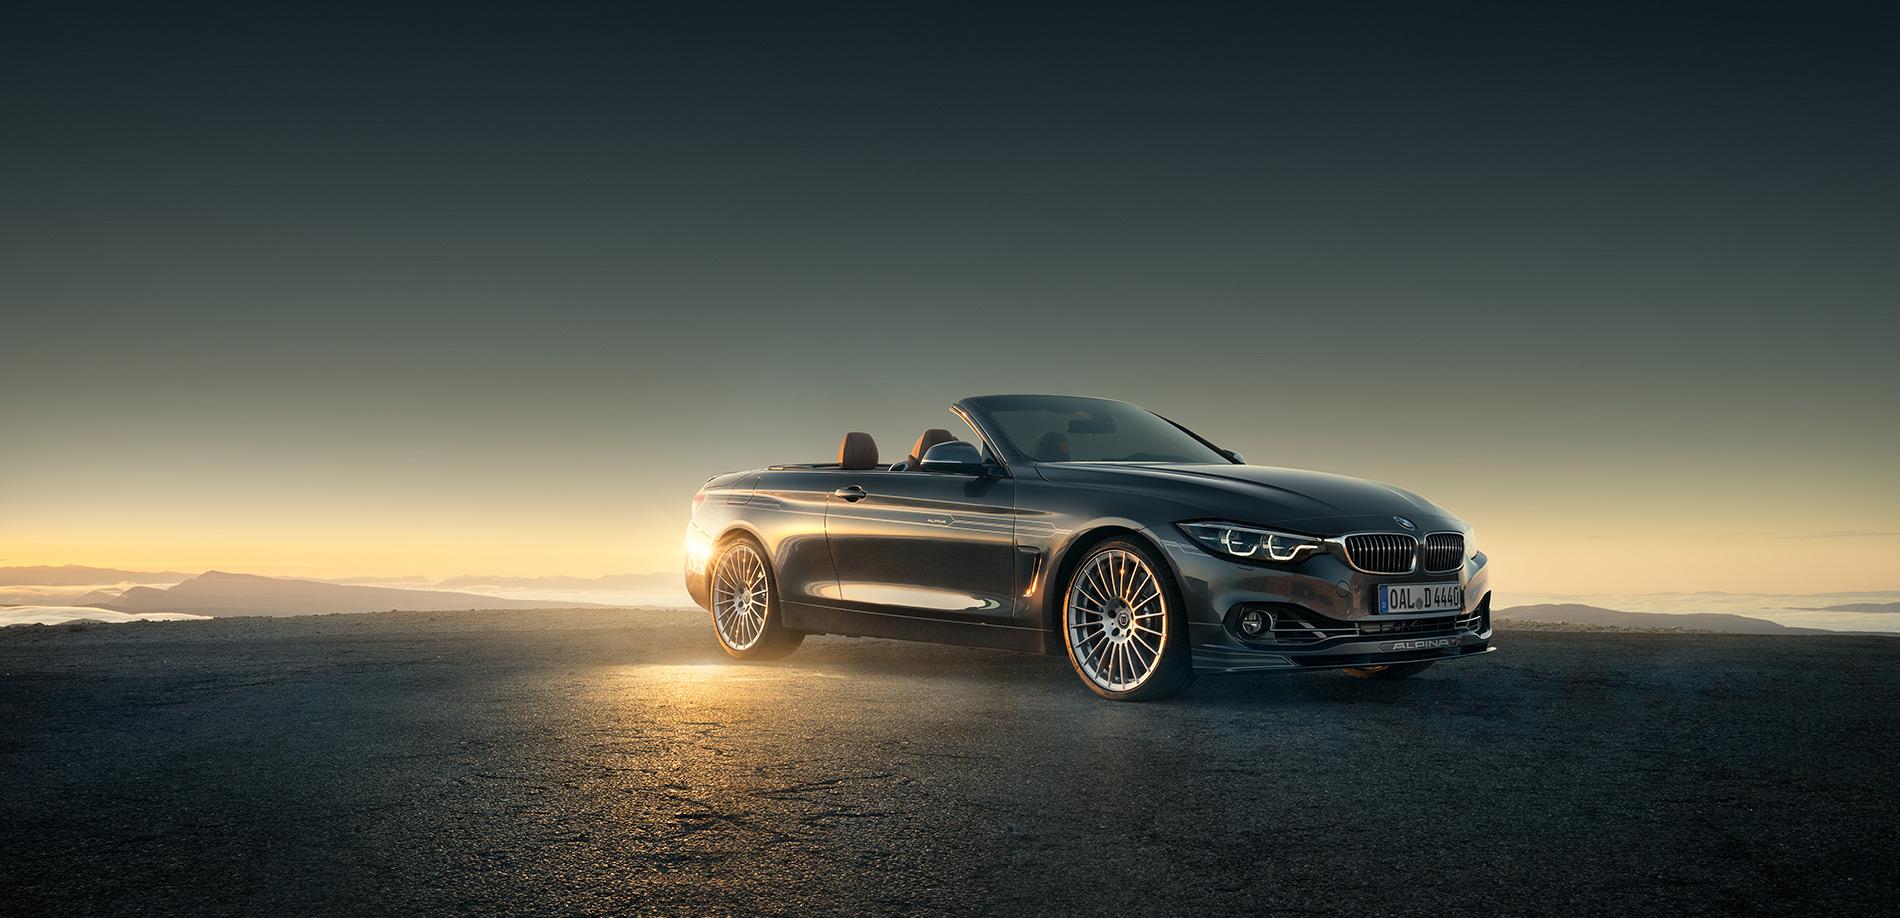 De Alpina Automobiles